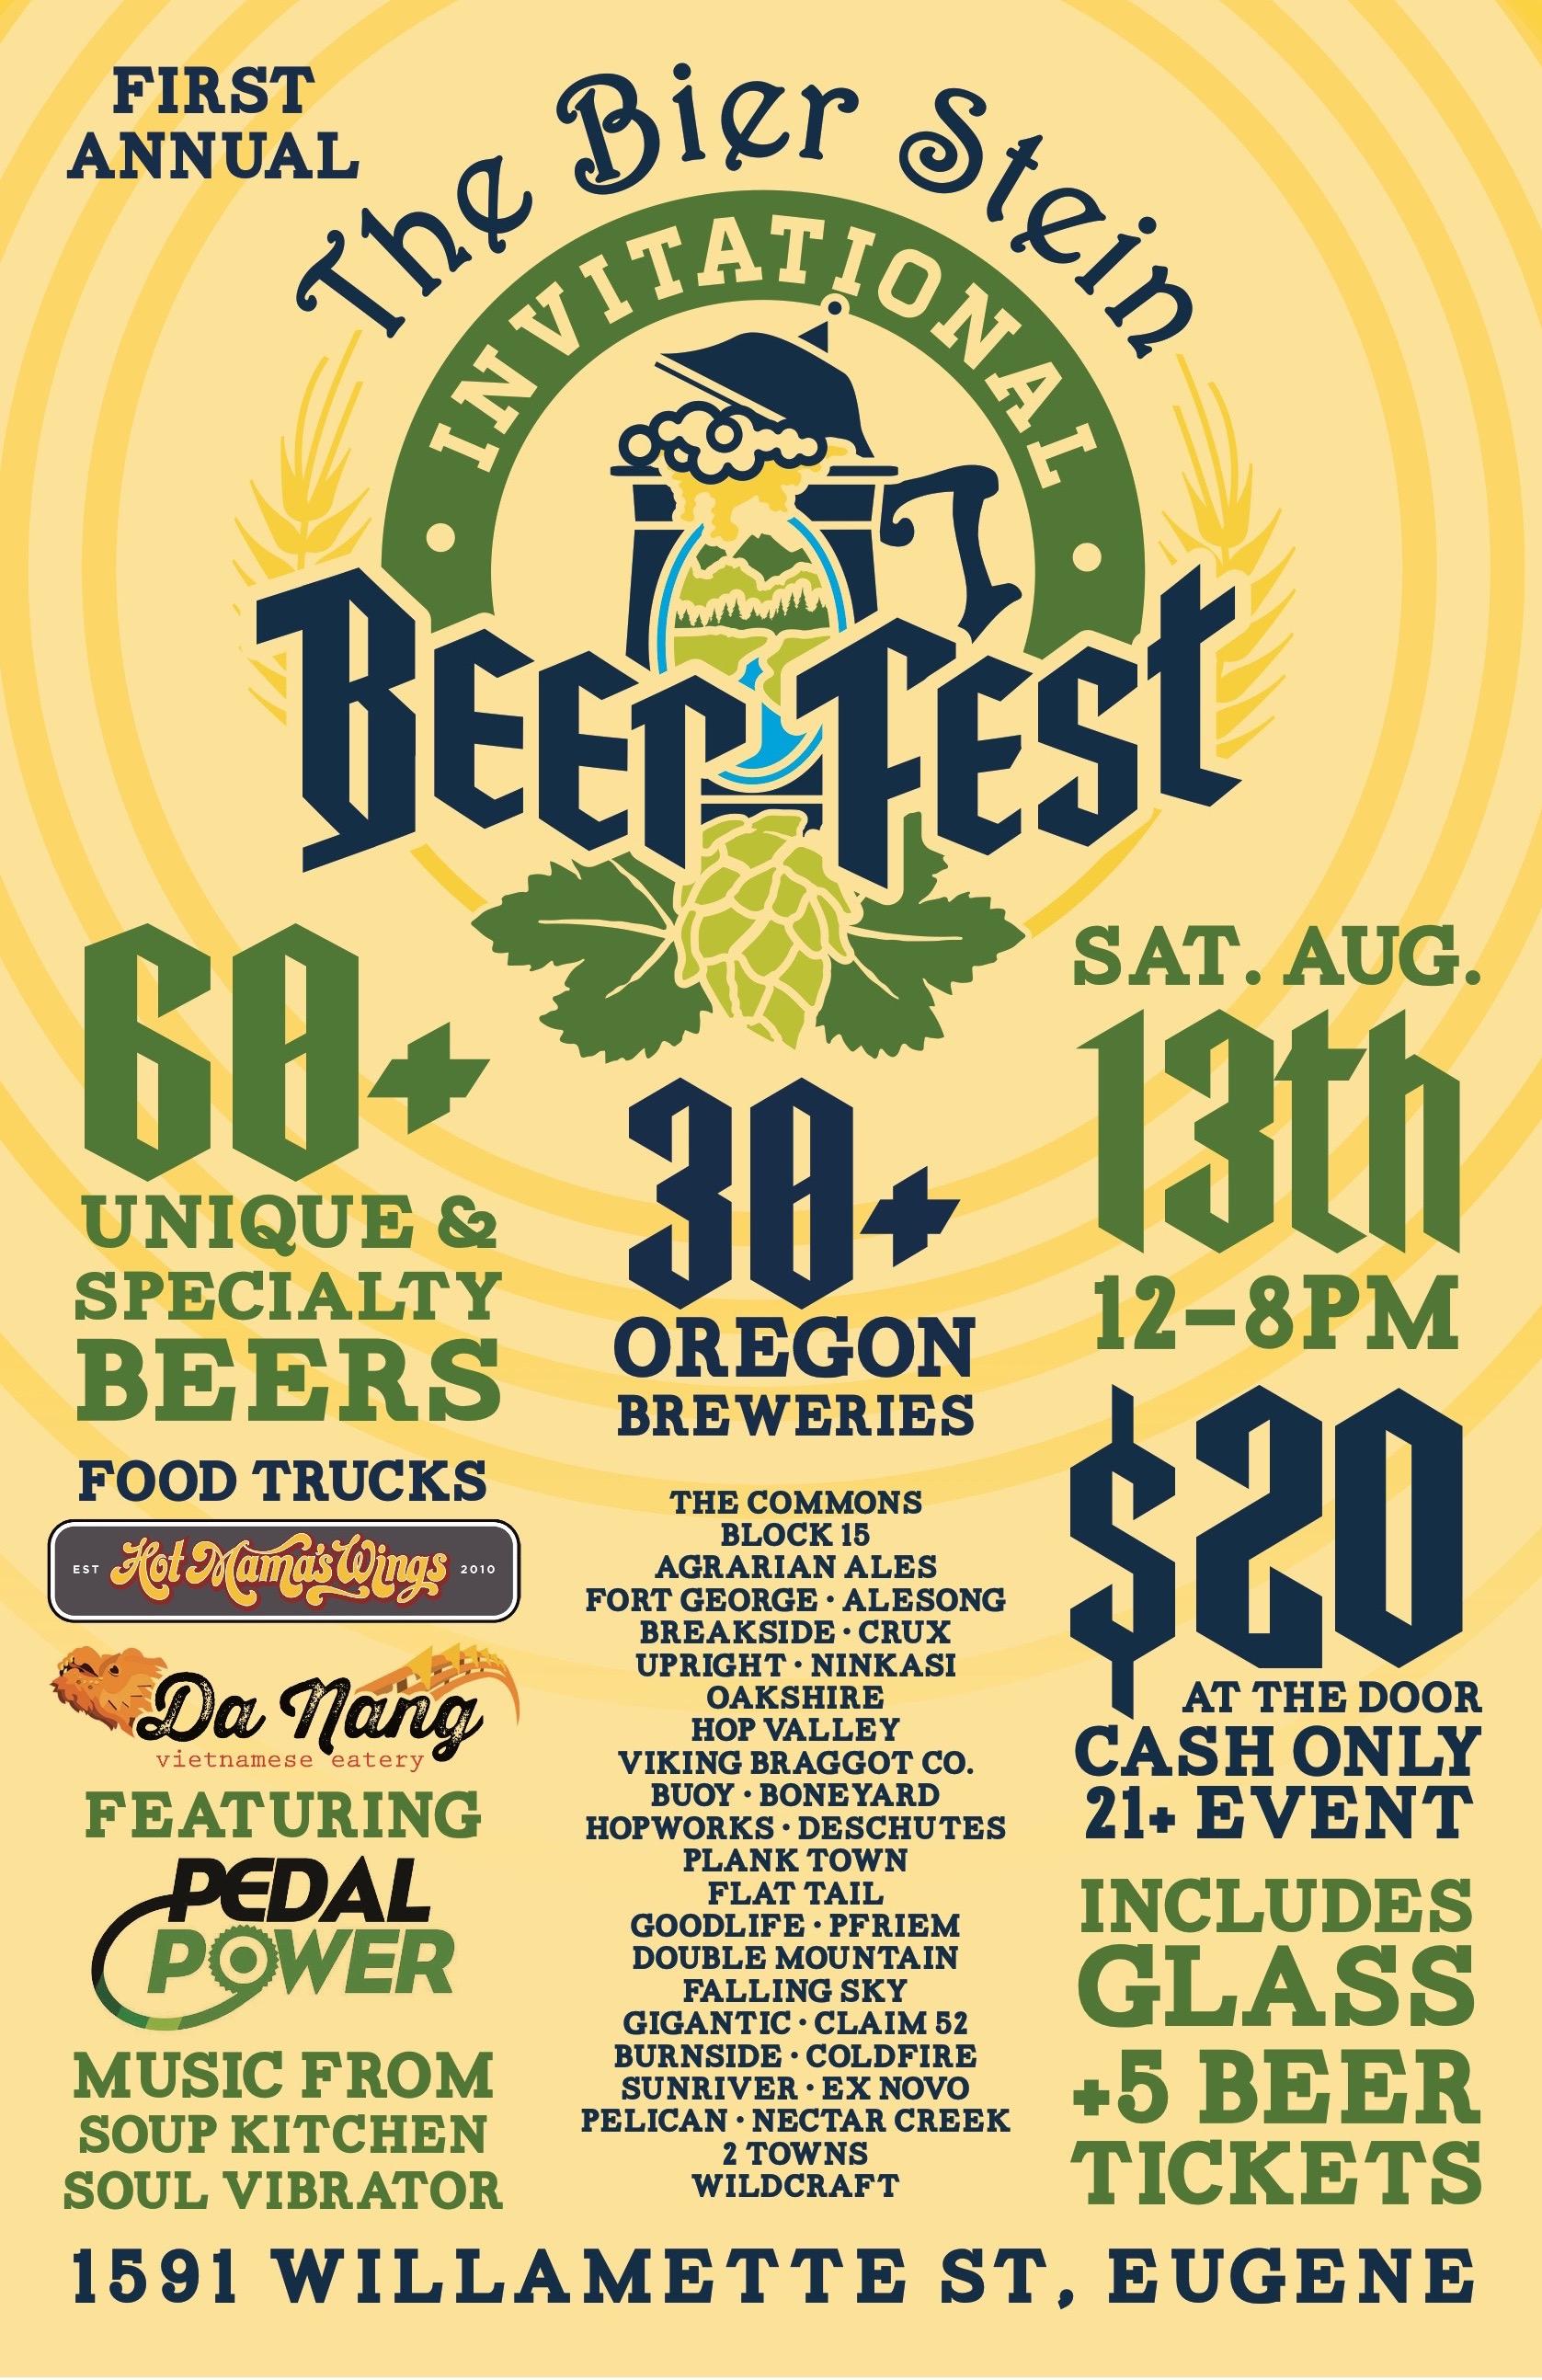 Bier Stein Invitational Beer Fest Poster